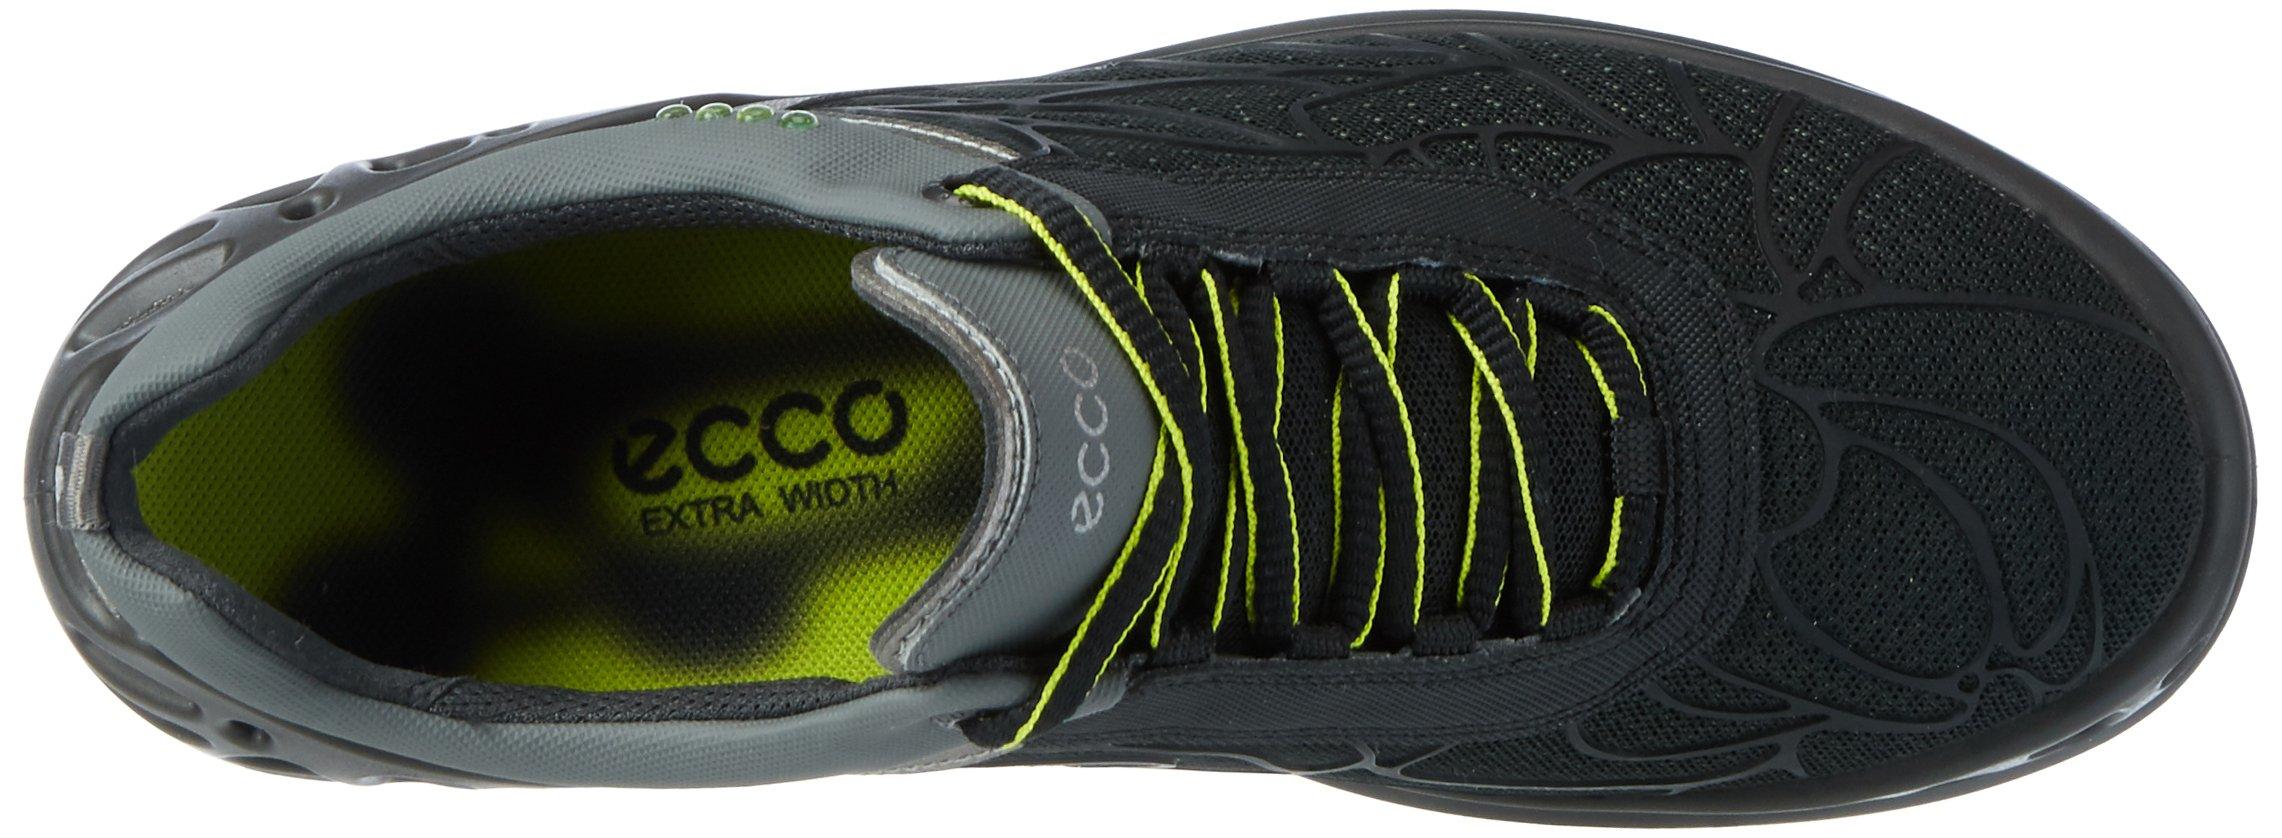 ECCO Women's Cage Evo Golf Shoe, Black, 41 EU/10-10.5 M US by ECCO (Image #7)